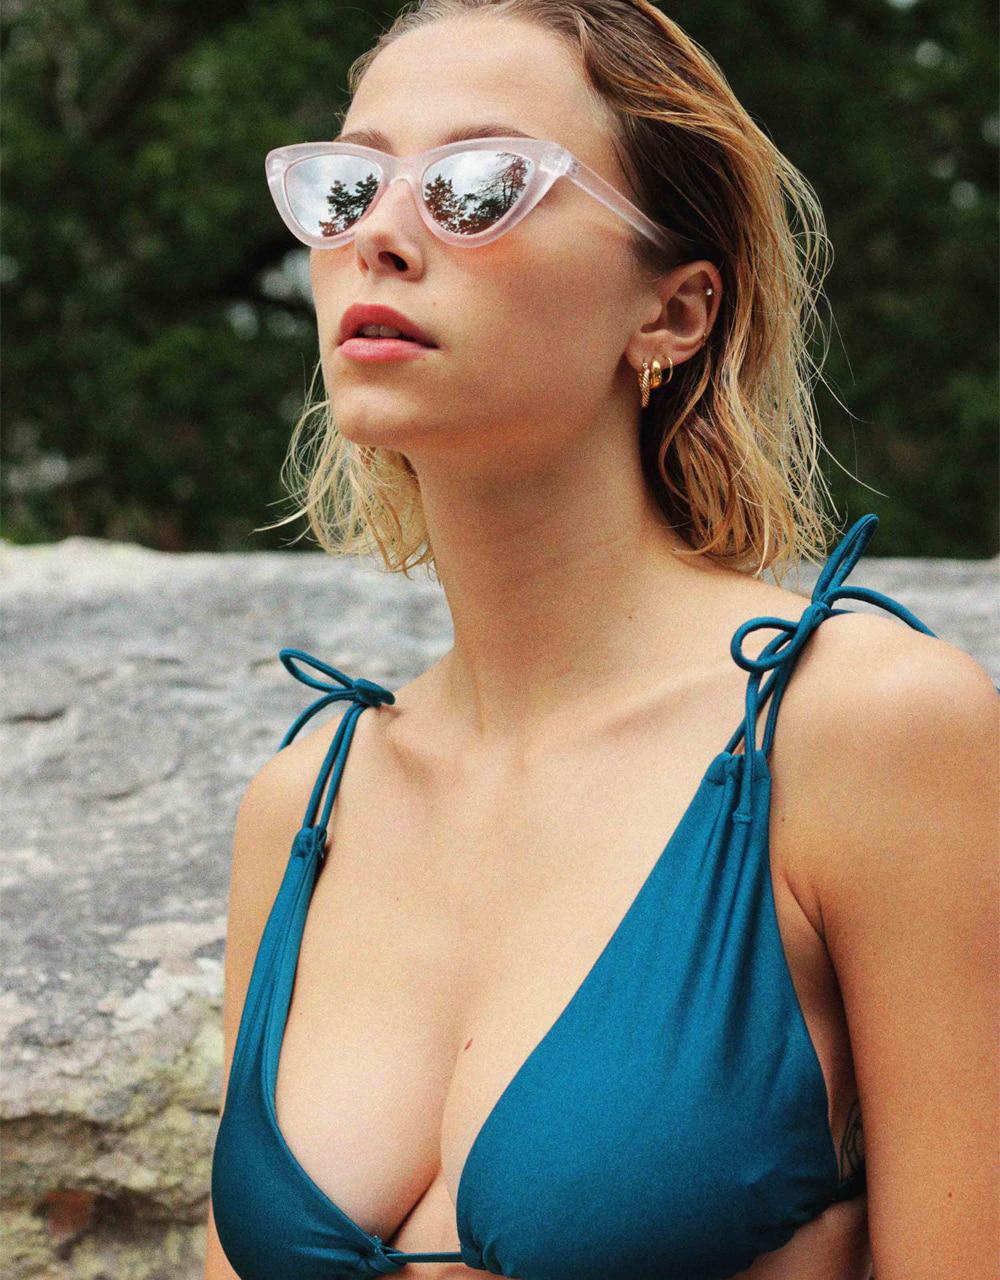 swimsuit bikini top Amalfi Blue 29 € Girls In Paris photo 1